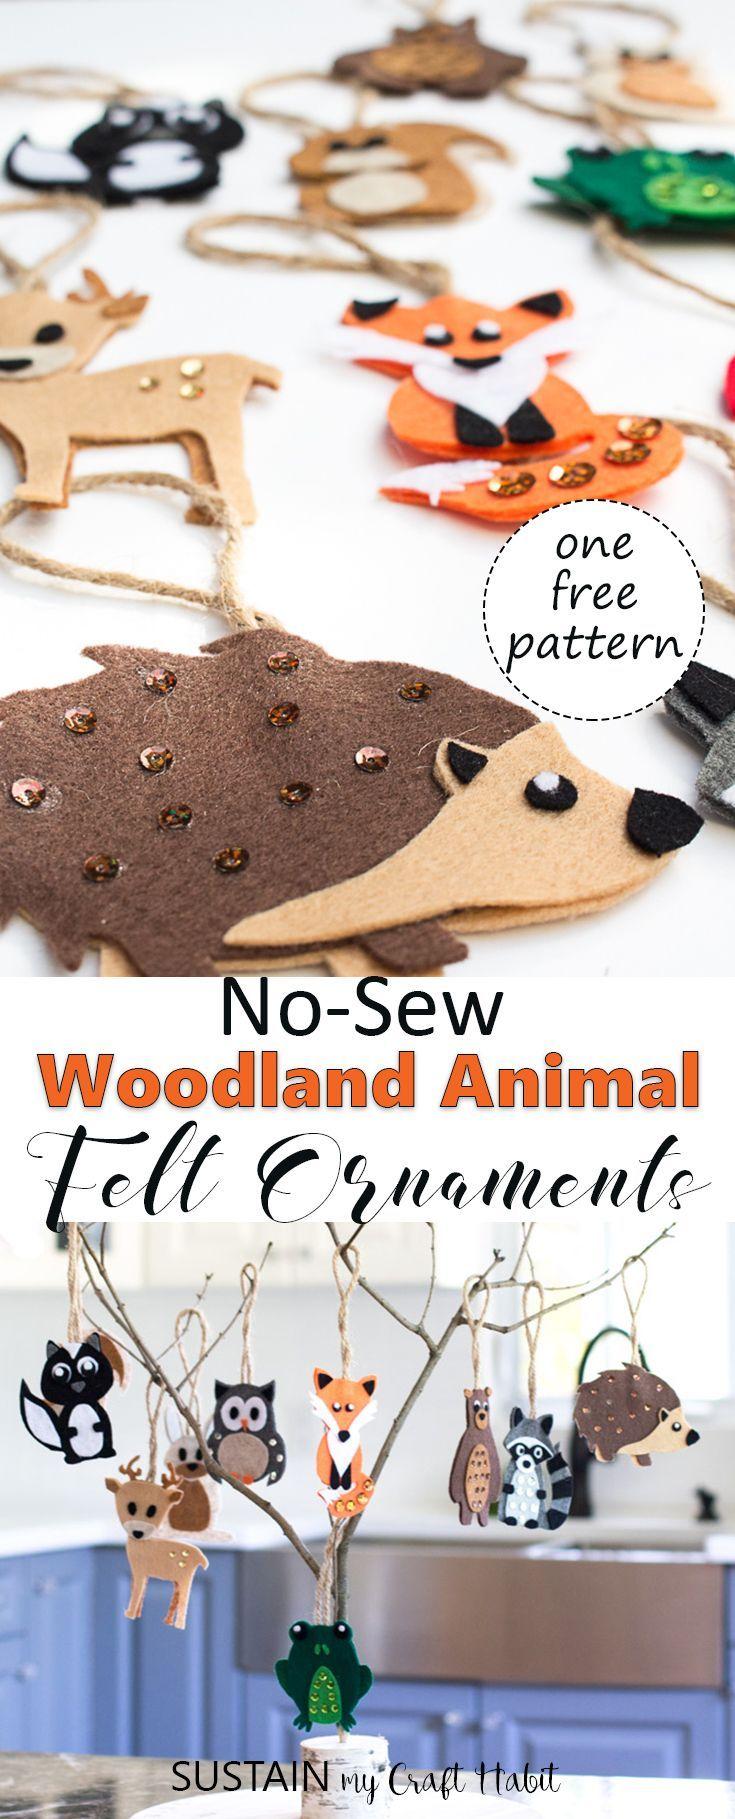 Diy Woodland Felt Ornaments Felt Ornaments Woodland